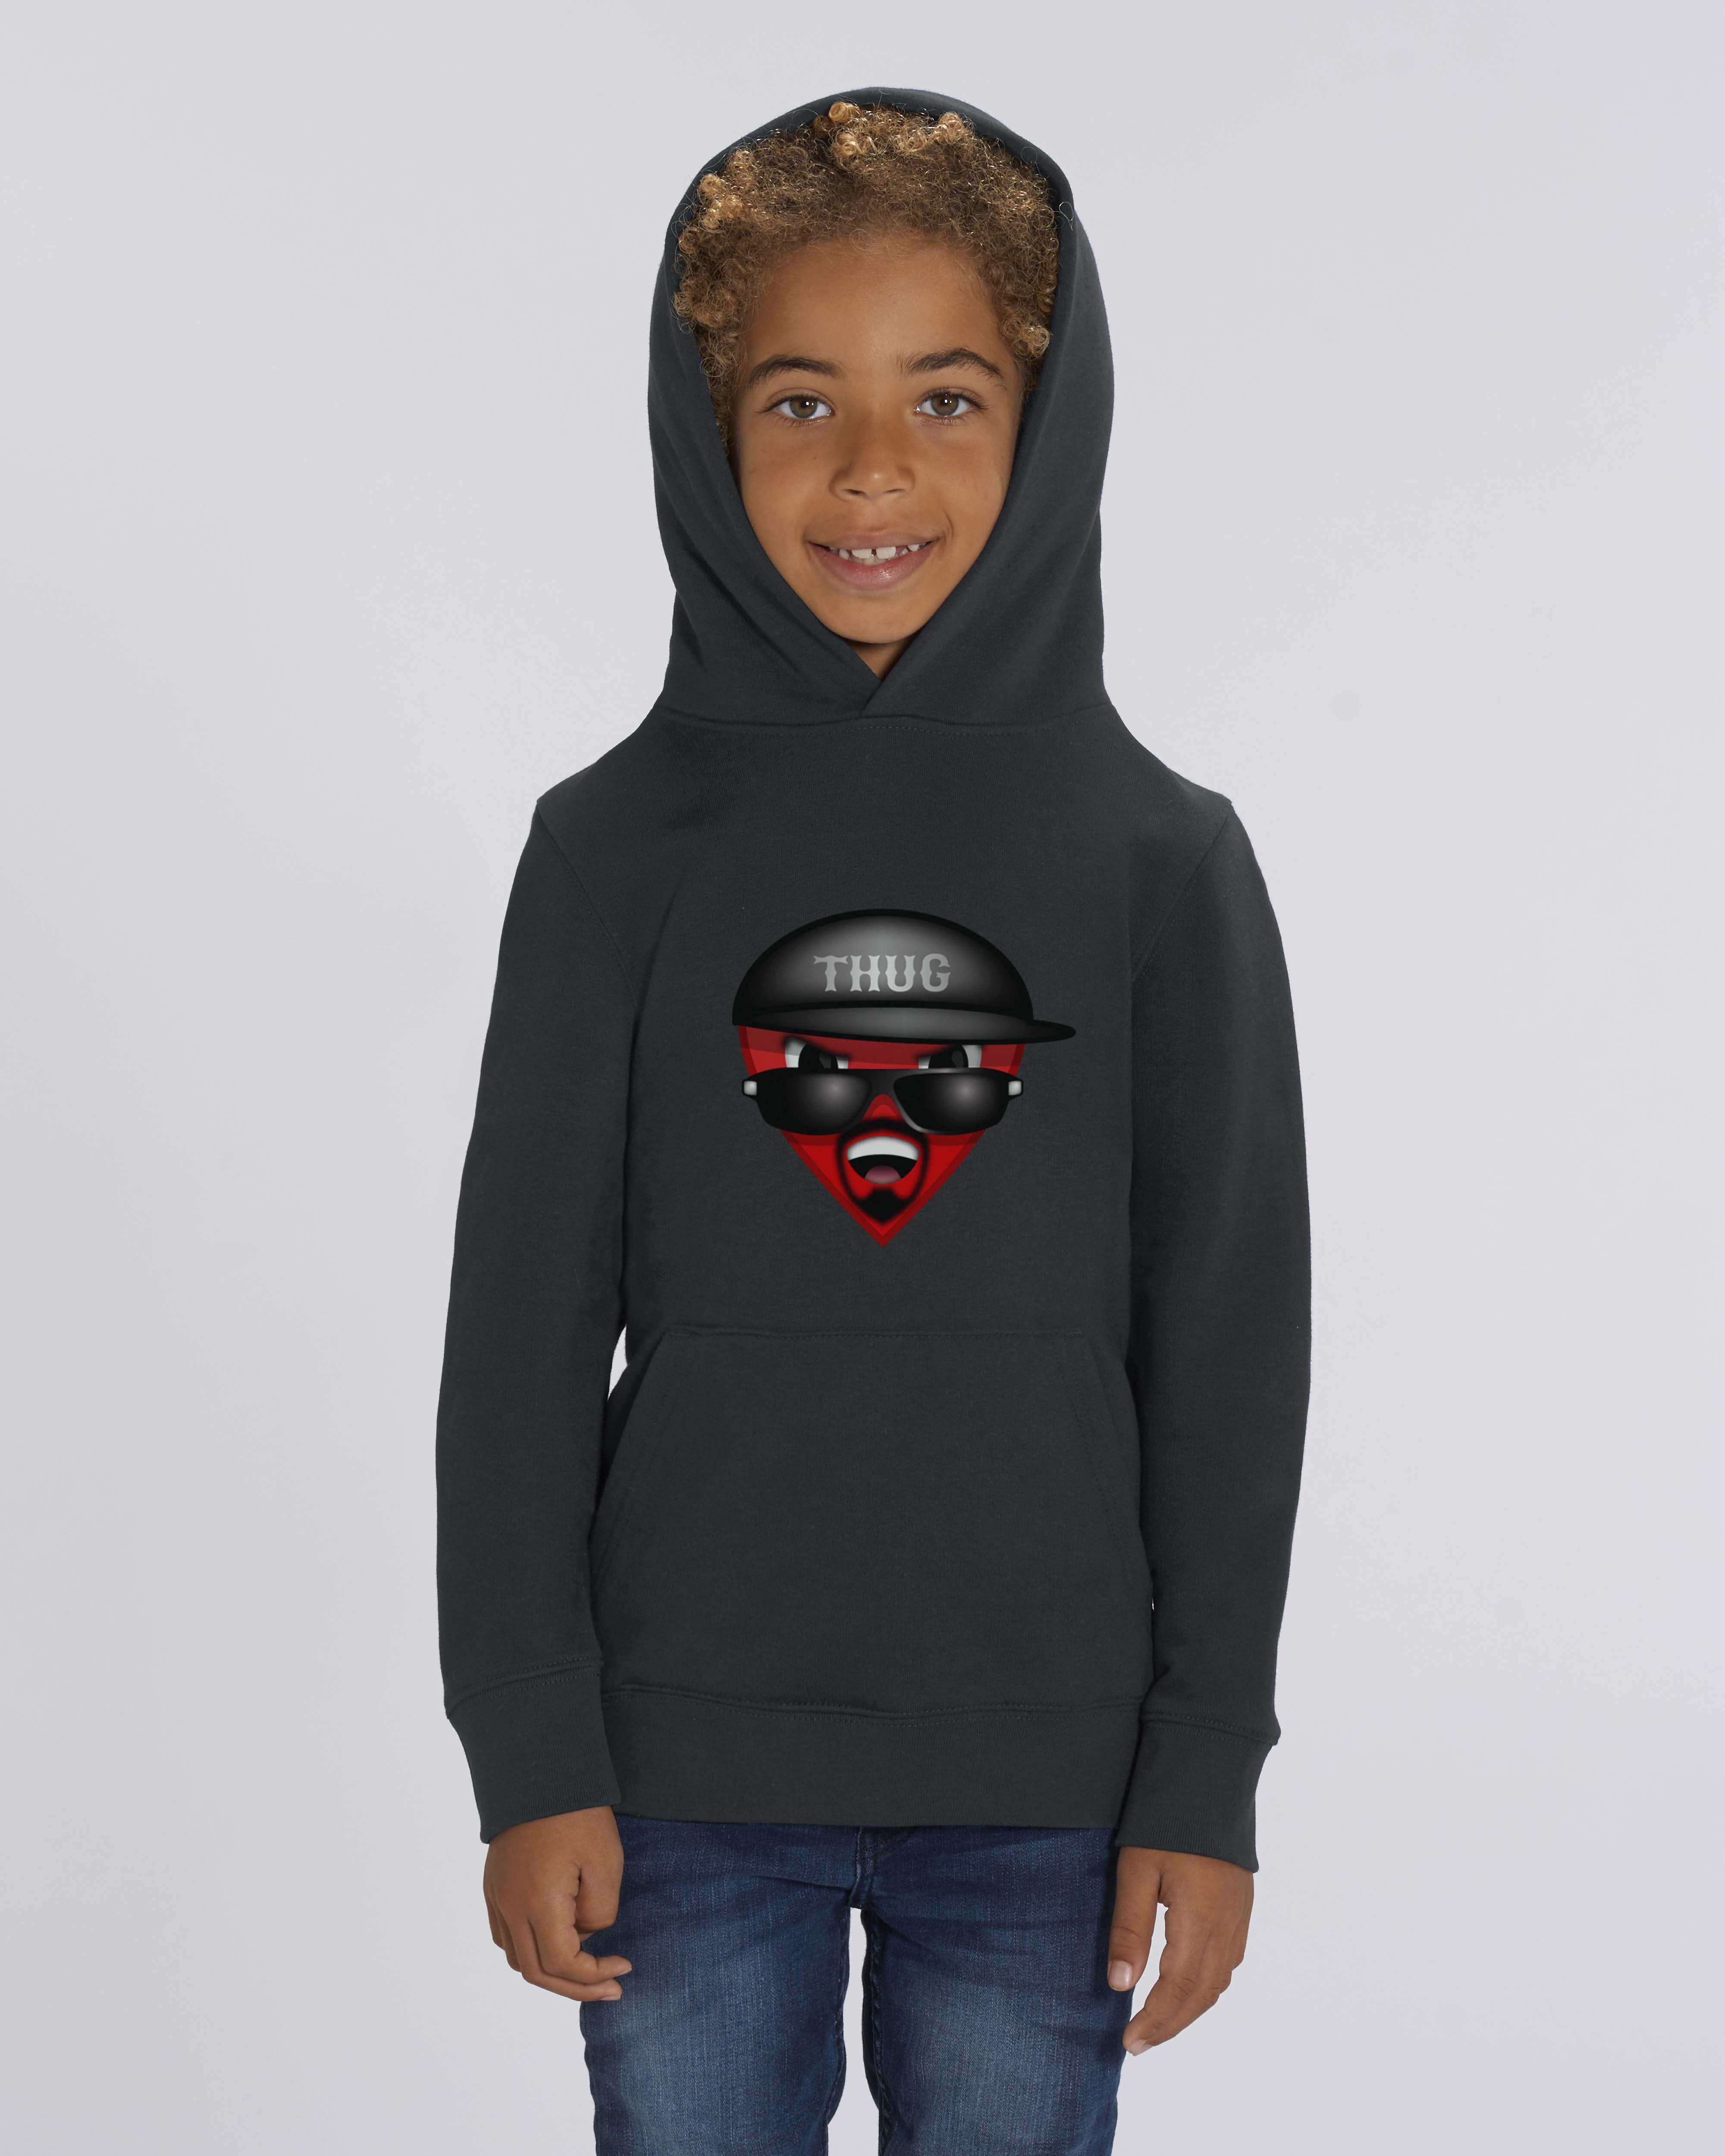 Organic black t-shirt for kids - Thuglife tee